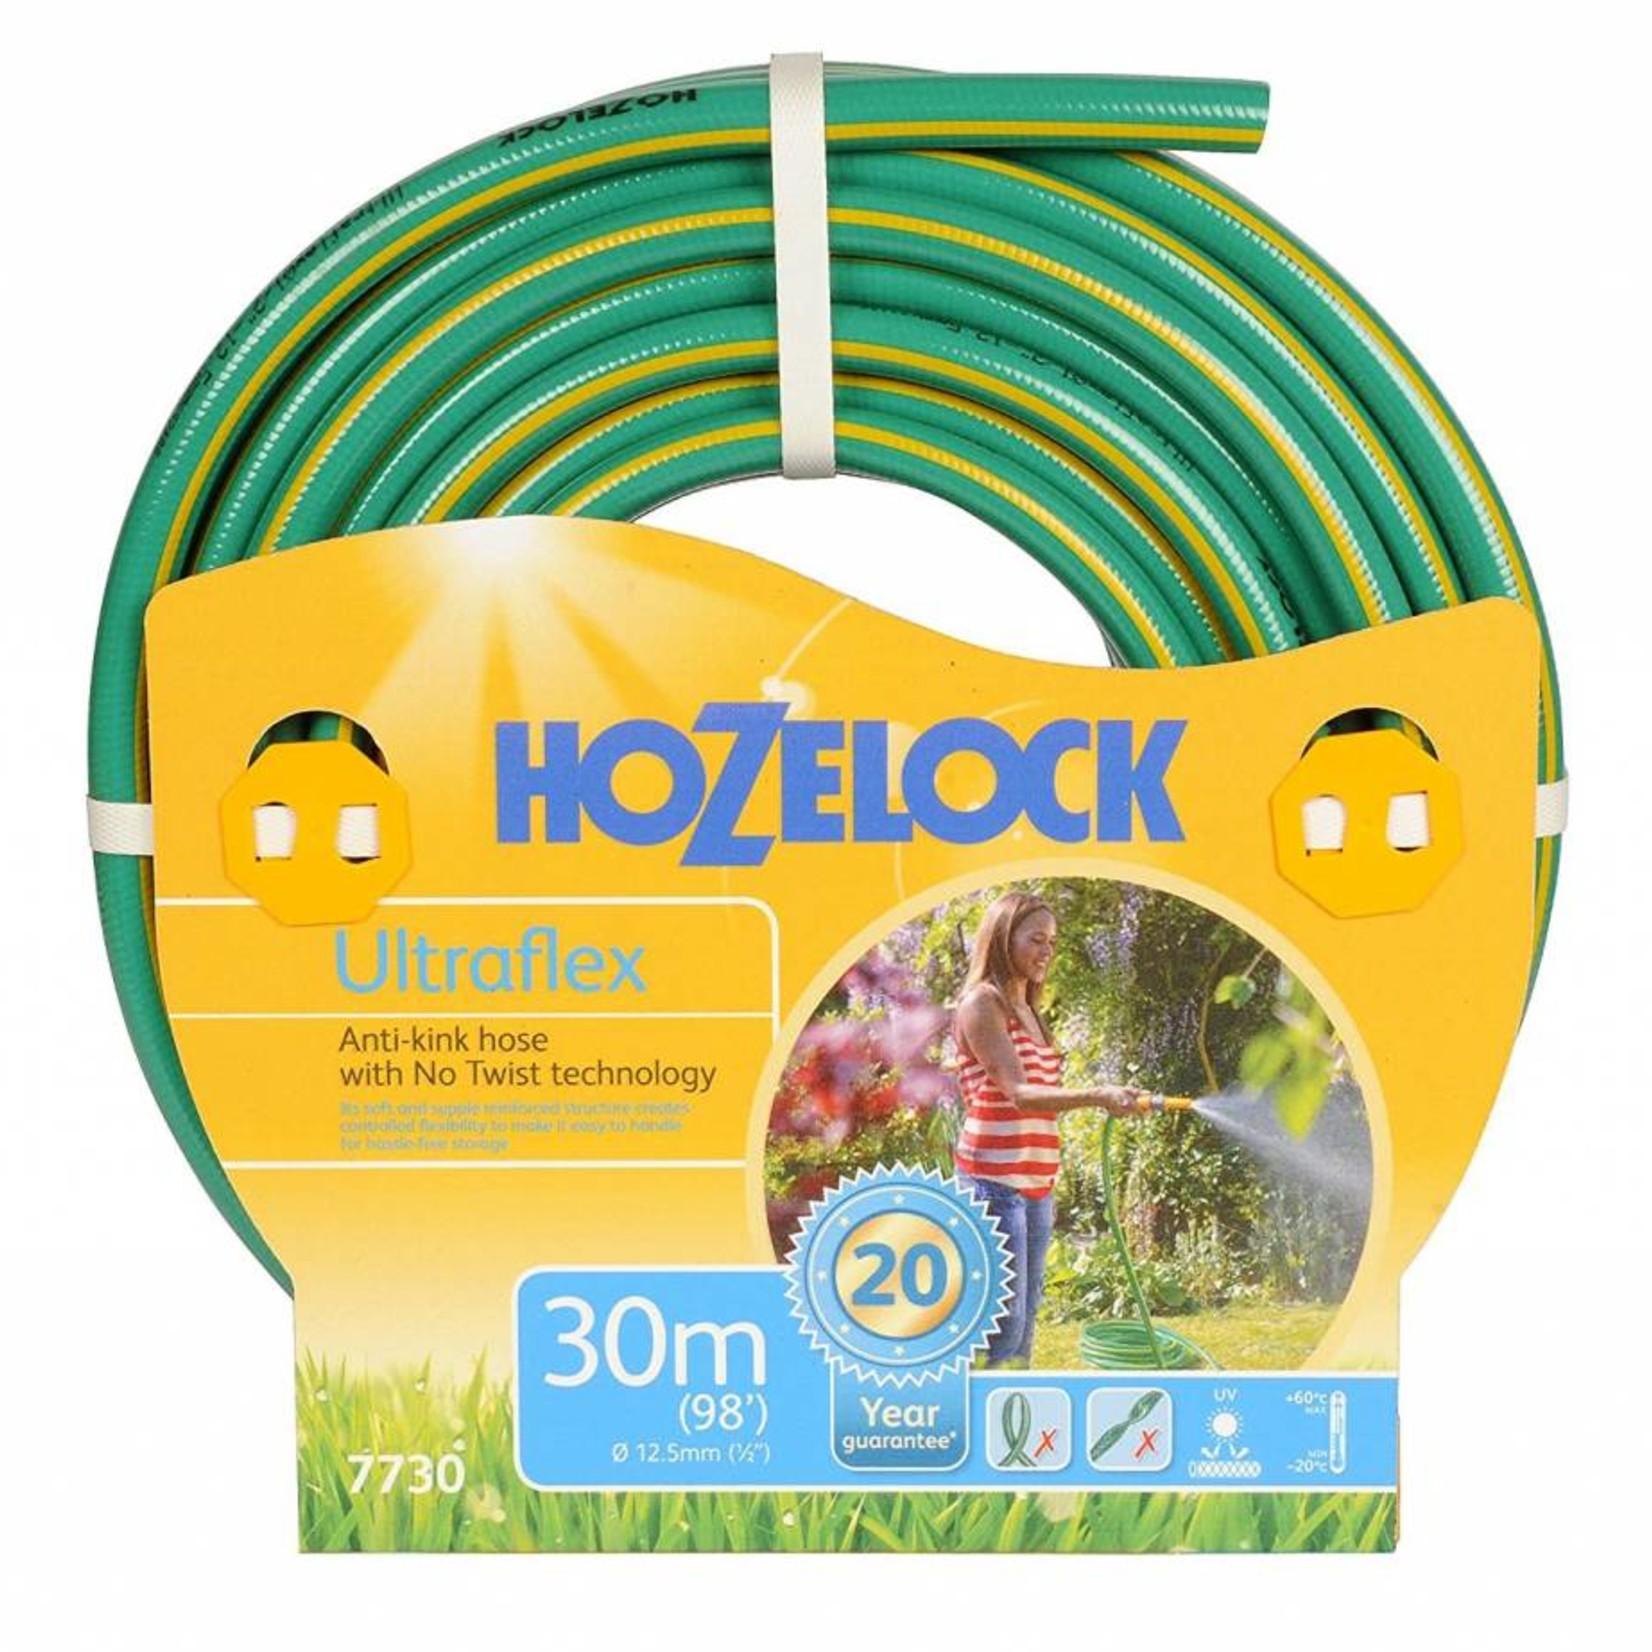 Hozelock HOZELOCK 30m ULTRAFLEX HOSE 7730